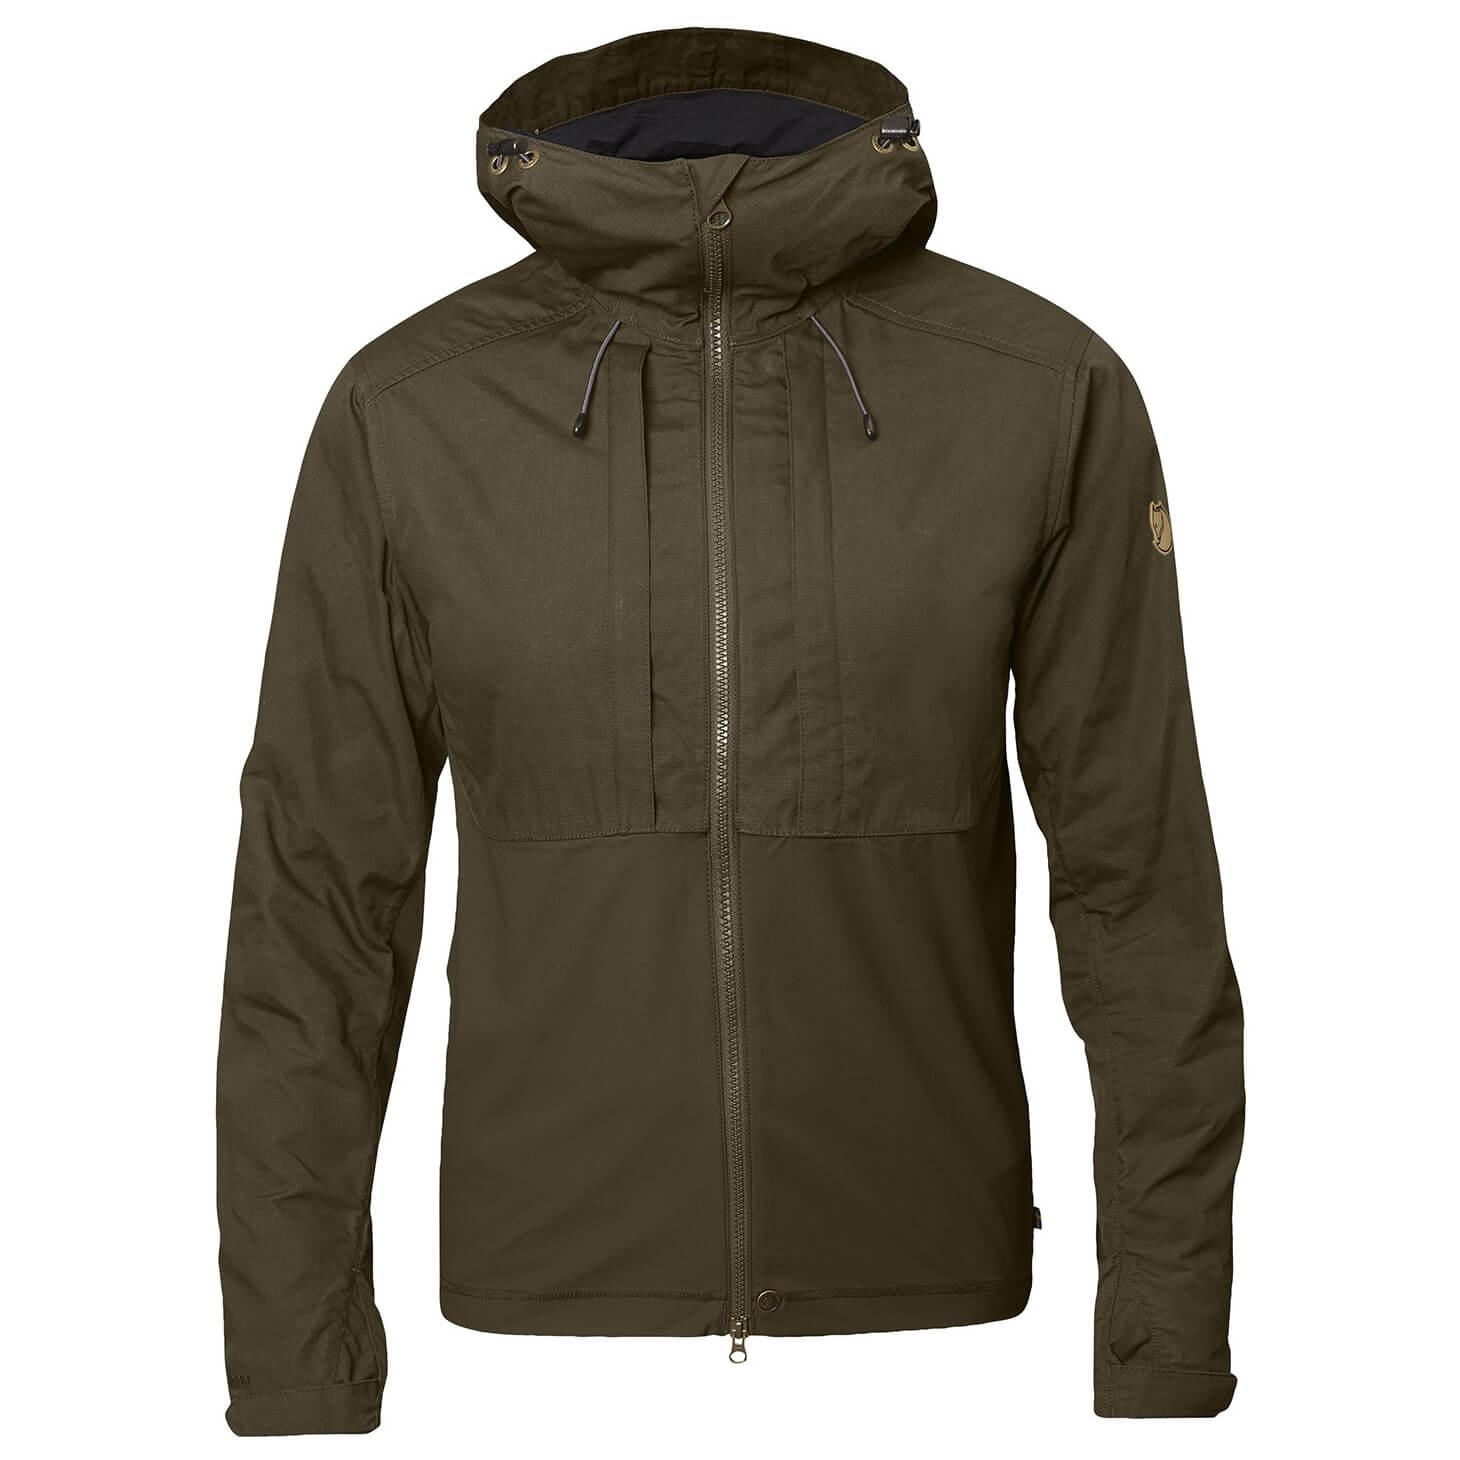 look out for designer fashion sells Fjällräven Abisko Lite Jacket - Softshell Jacket Men's | Buy ...